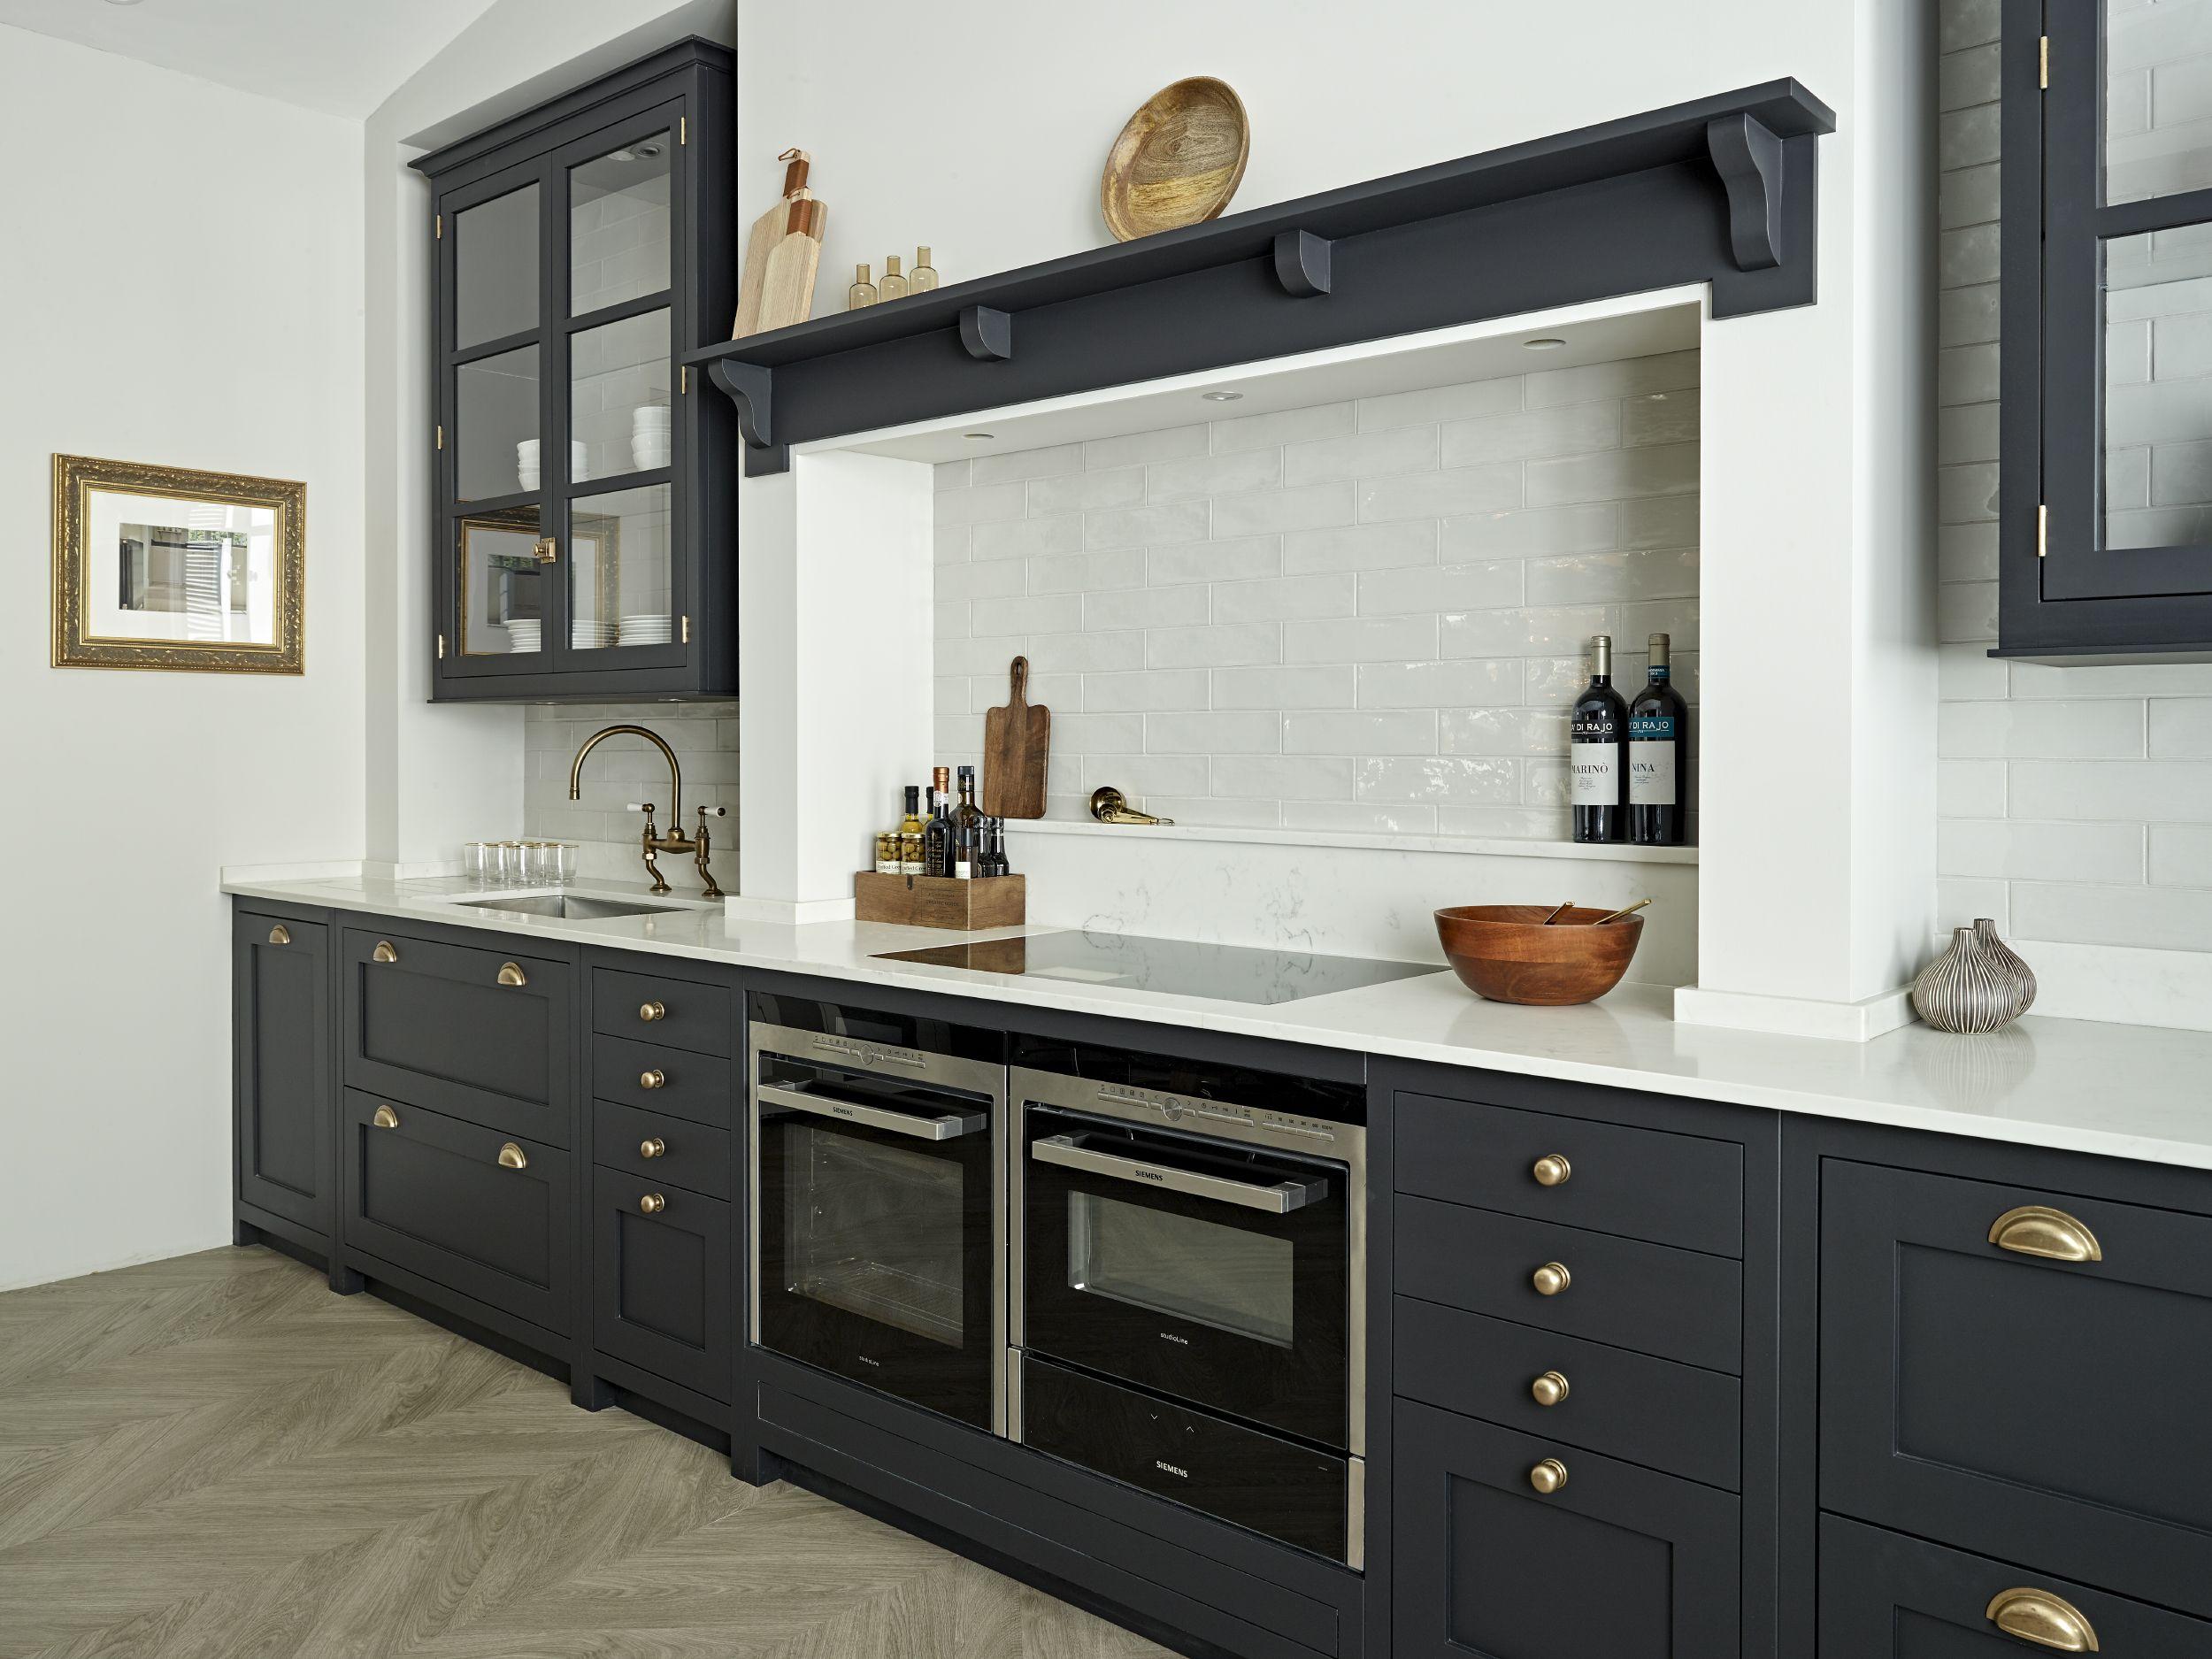 Kitchens Beautiful Bespoke Kitchen Design In 2020 New Kitchen Cabinets Kitchen Design Kitchen Cabinets